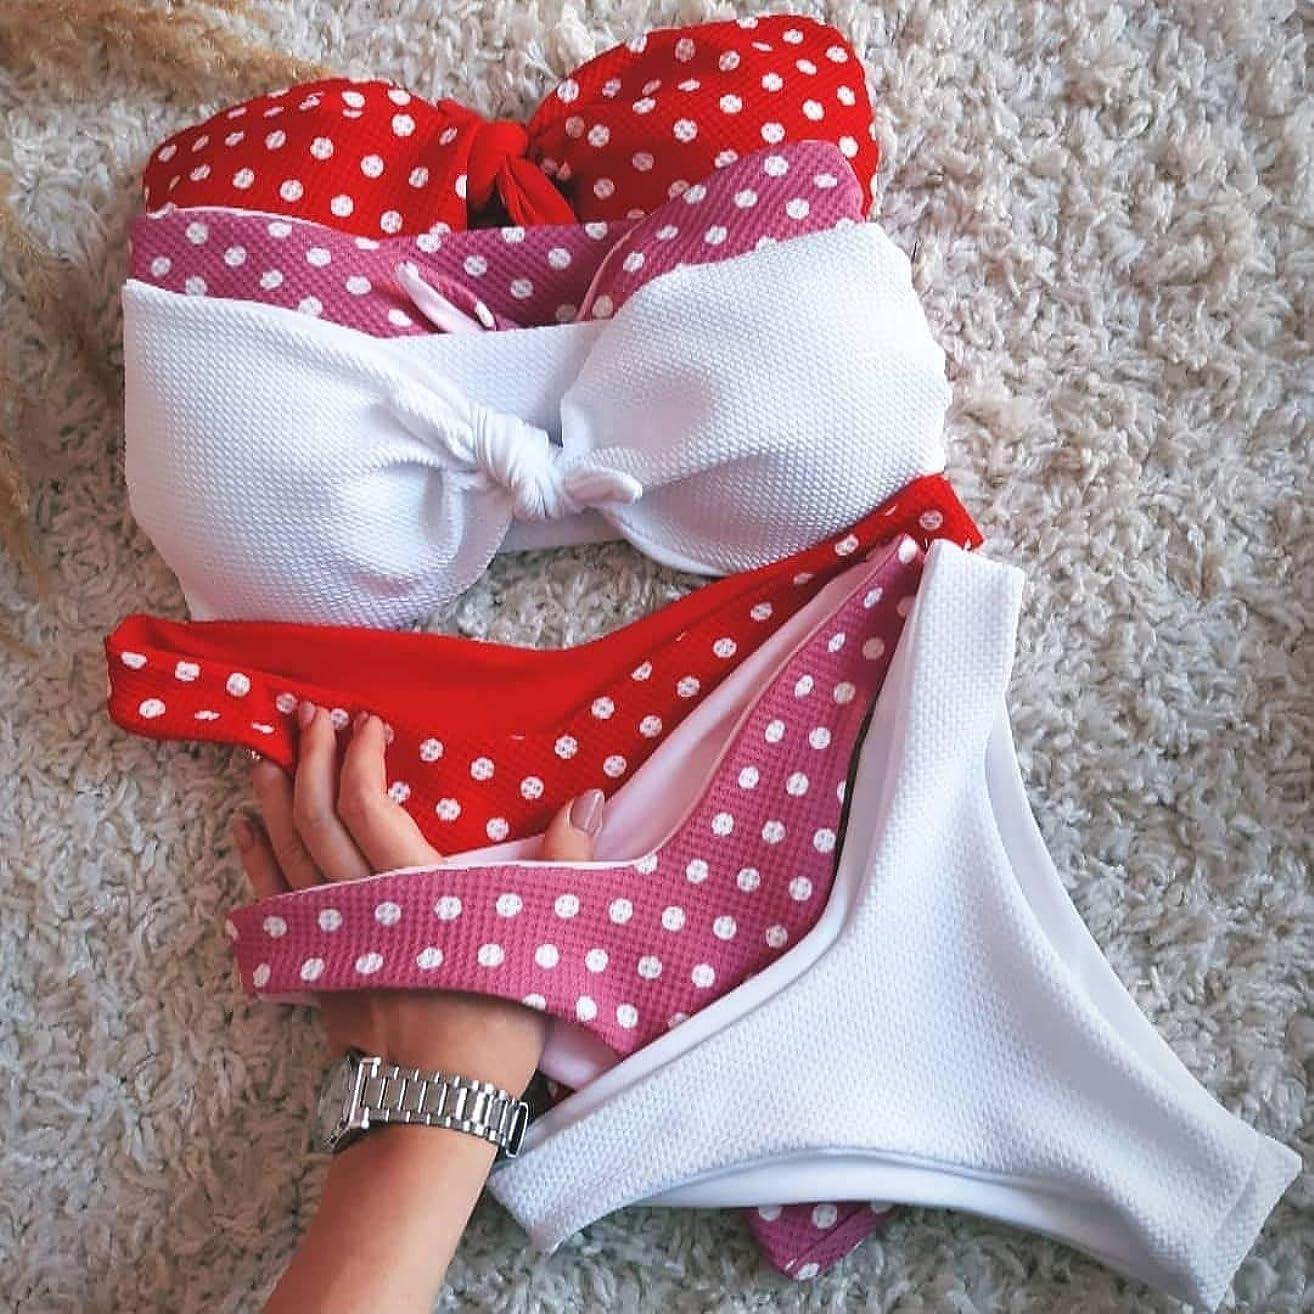 Two Pieces Swimsuit for Women Swimwear Polka dots Vintage swimsuit V-Bikini Bottoms Swimsuit for Ladies Plus Size Swimwear Wedding Bathing suit Honeymoon Swimwear High Waisted Swimming suit Beachwear